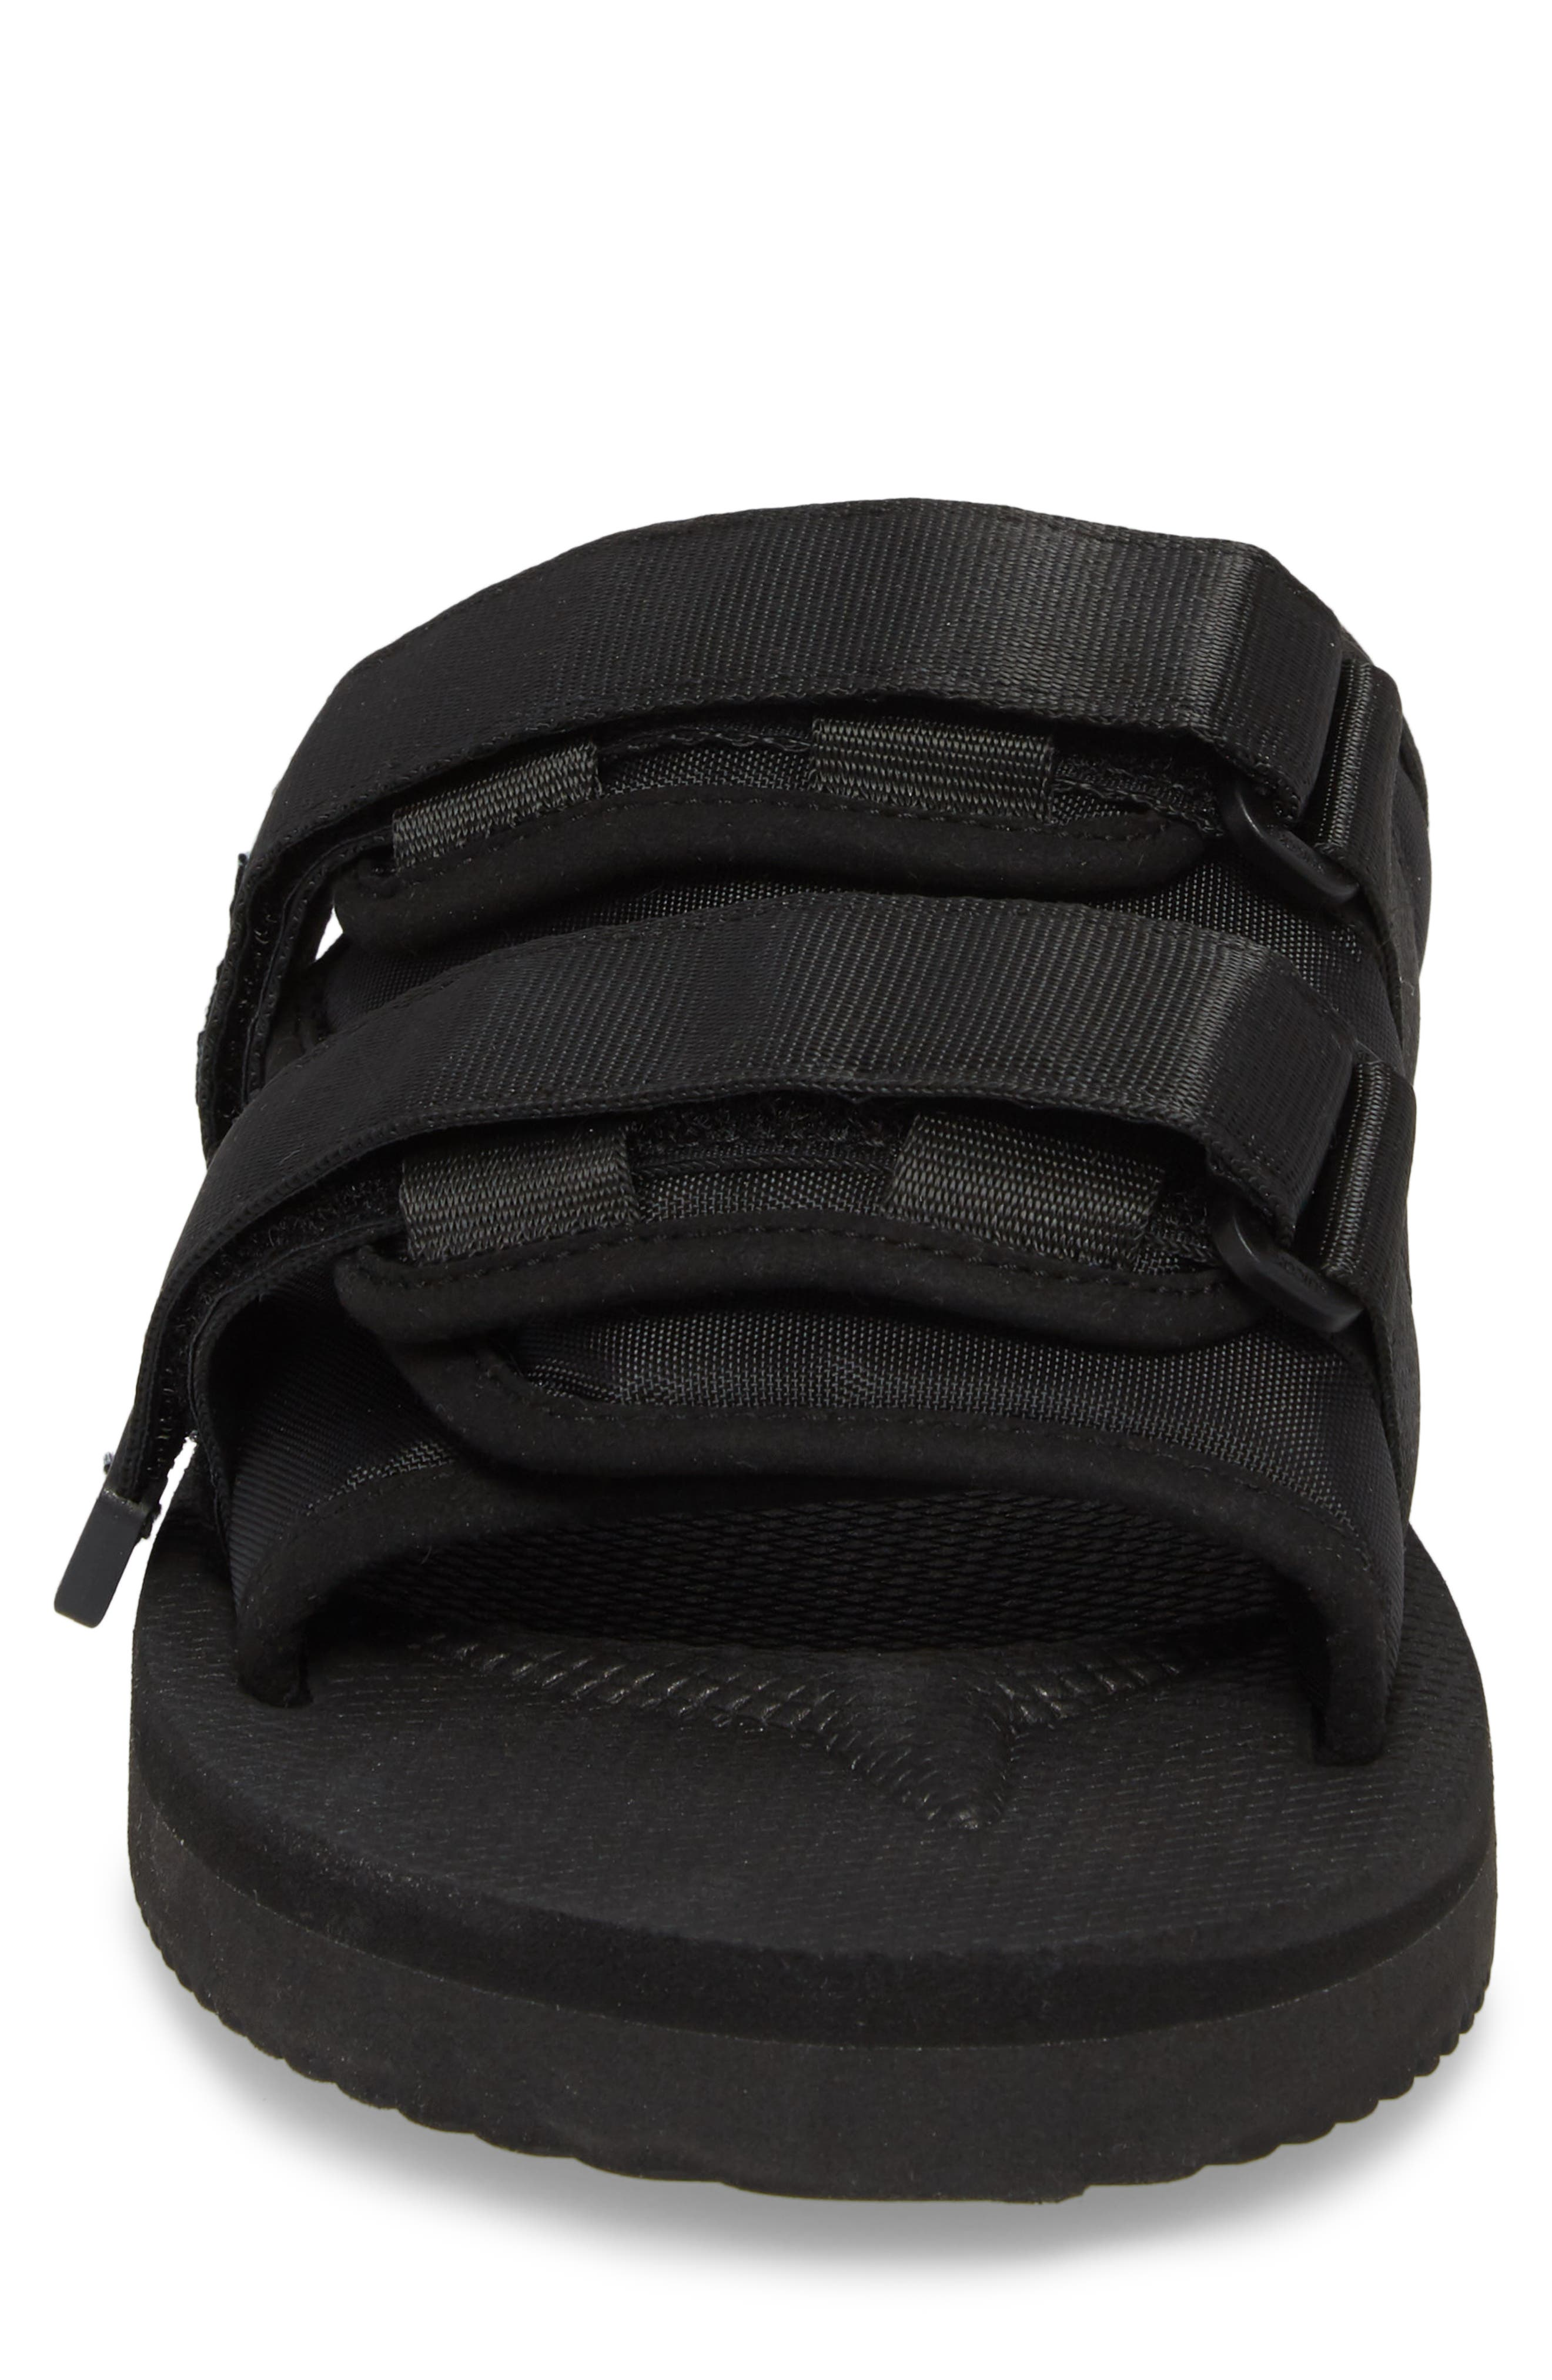 Moto Cab Slide Sandal,                             Alternate thumbnail 4, color,                             Black